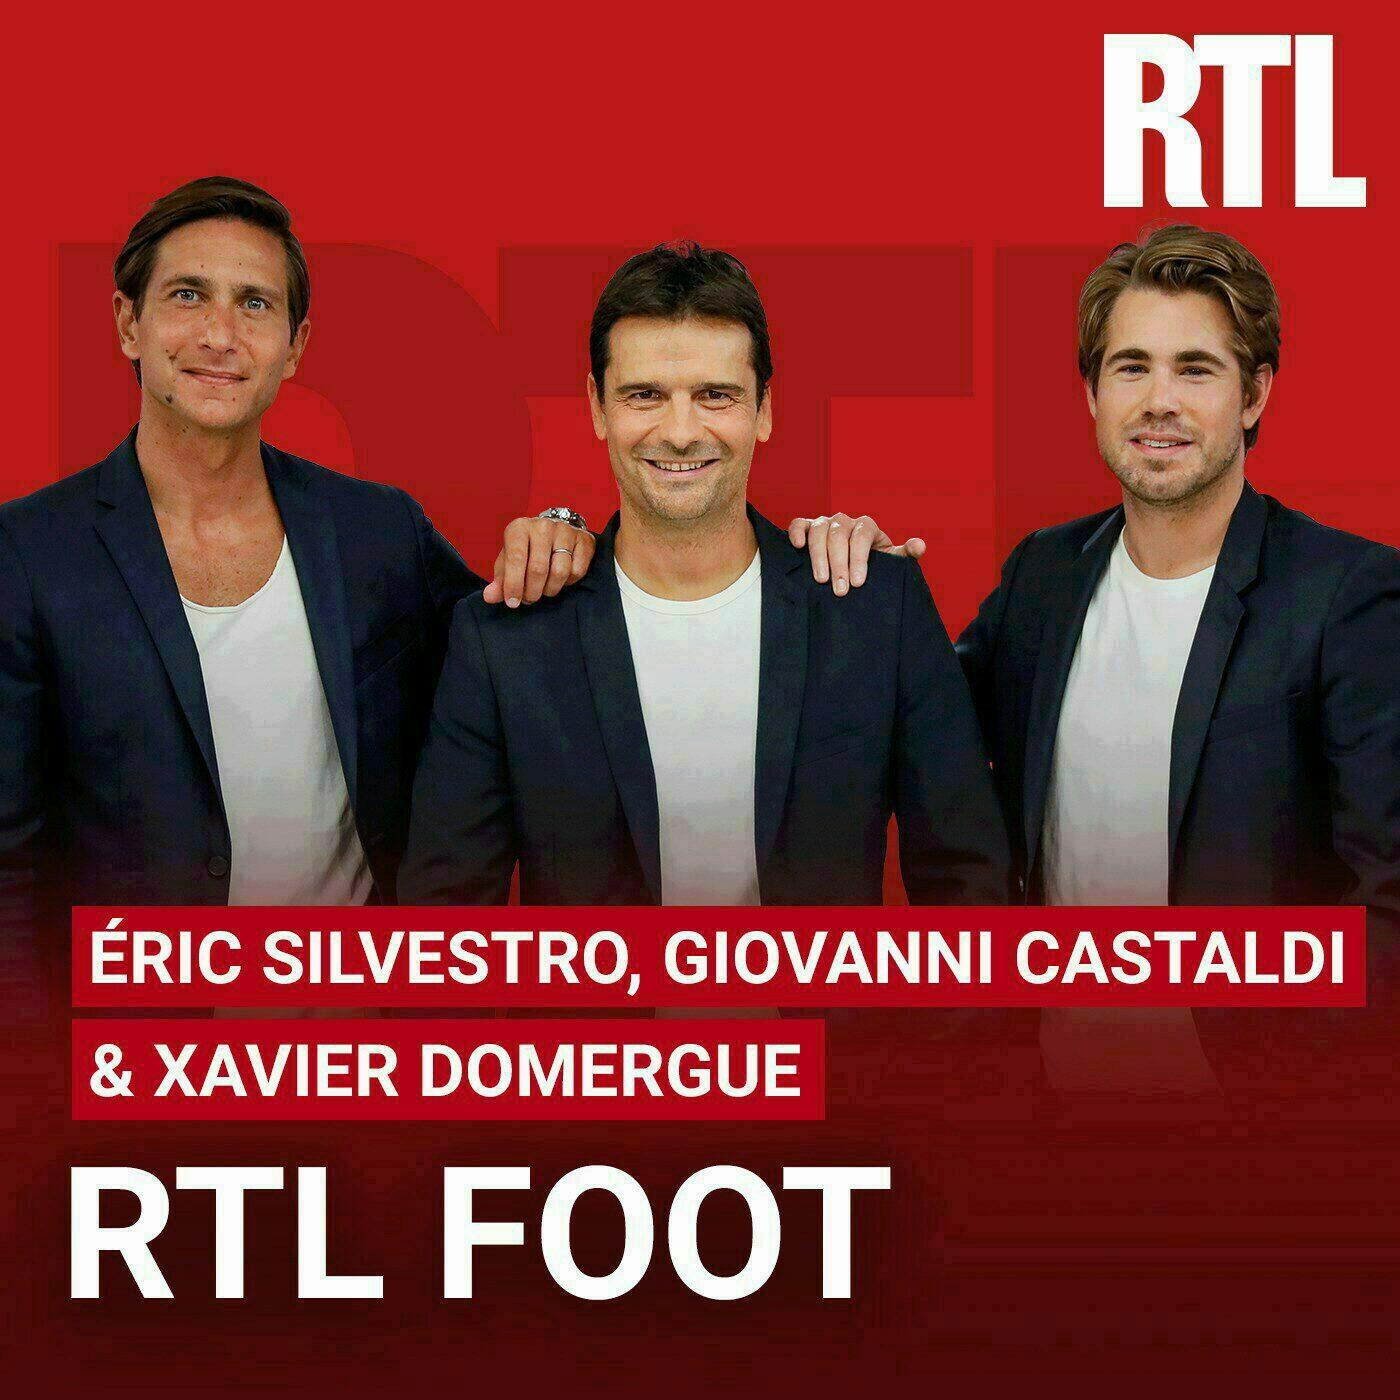 Image 1: RTL Foot